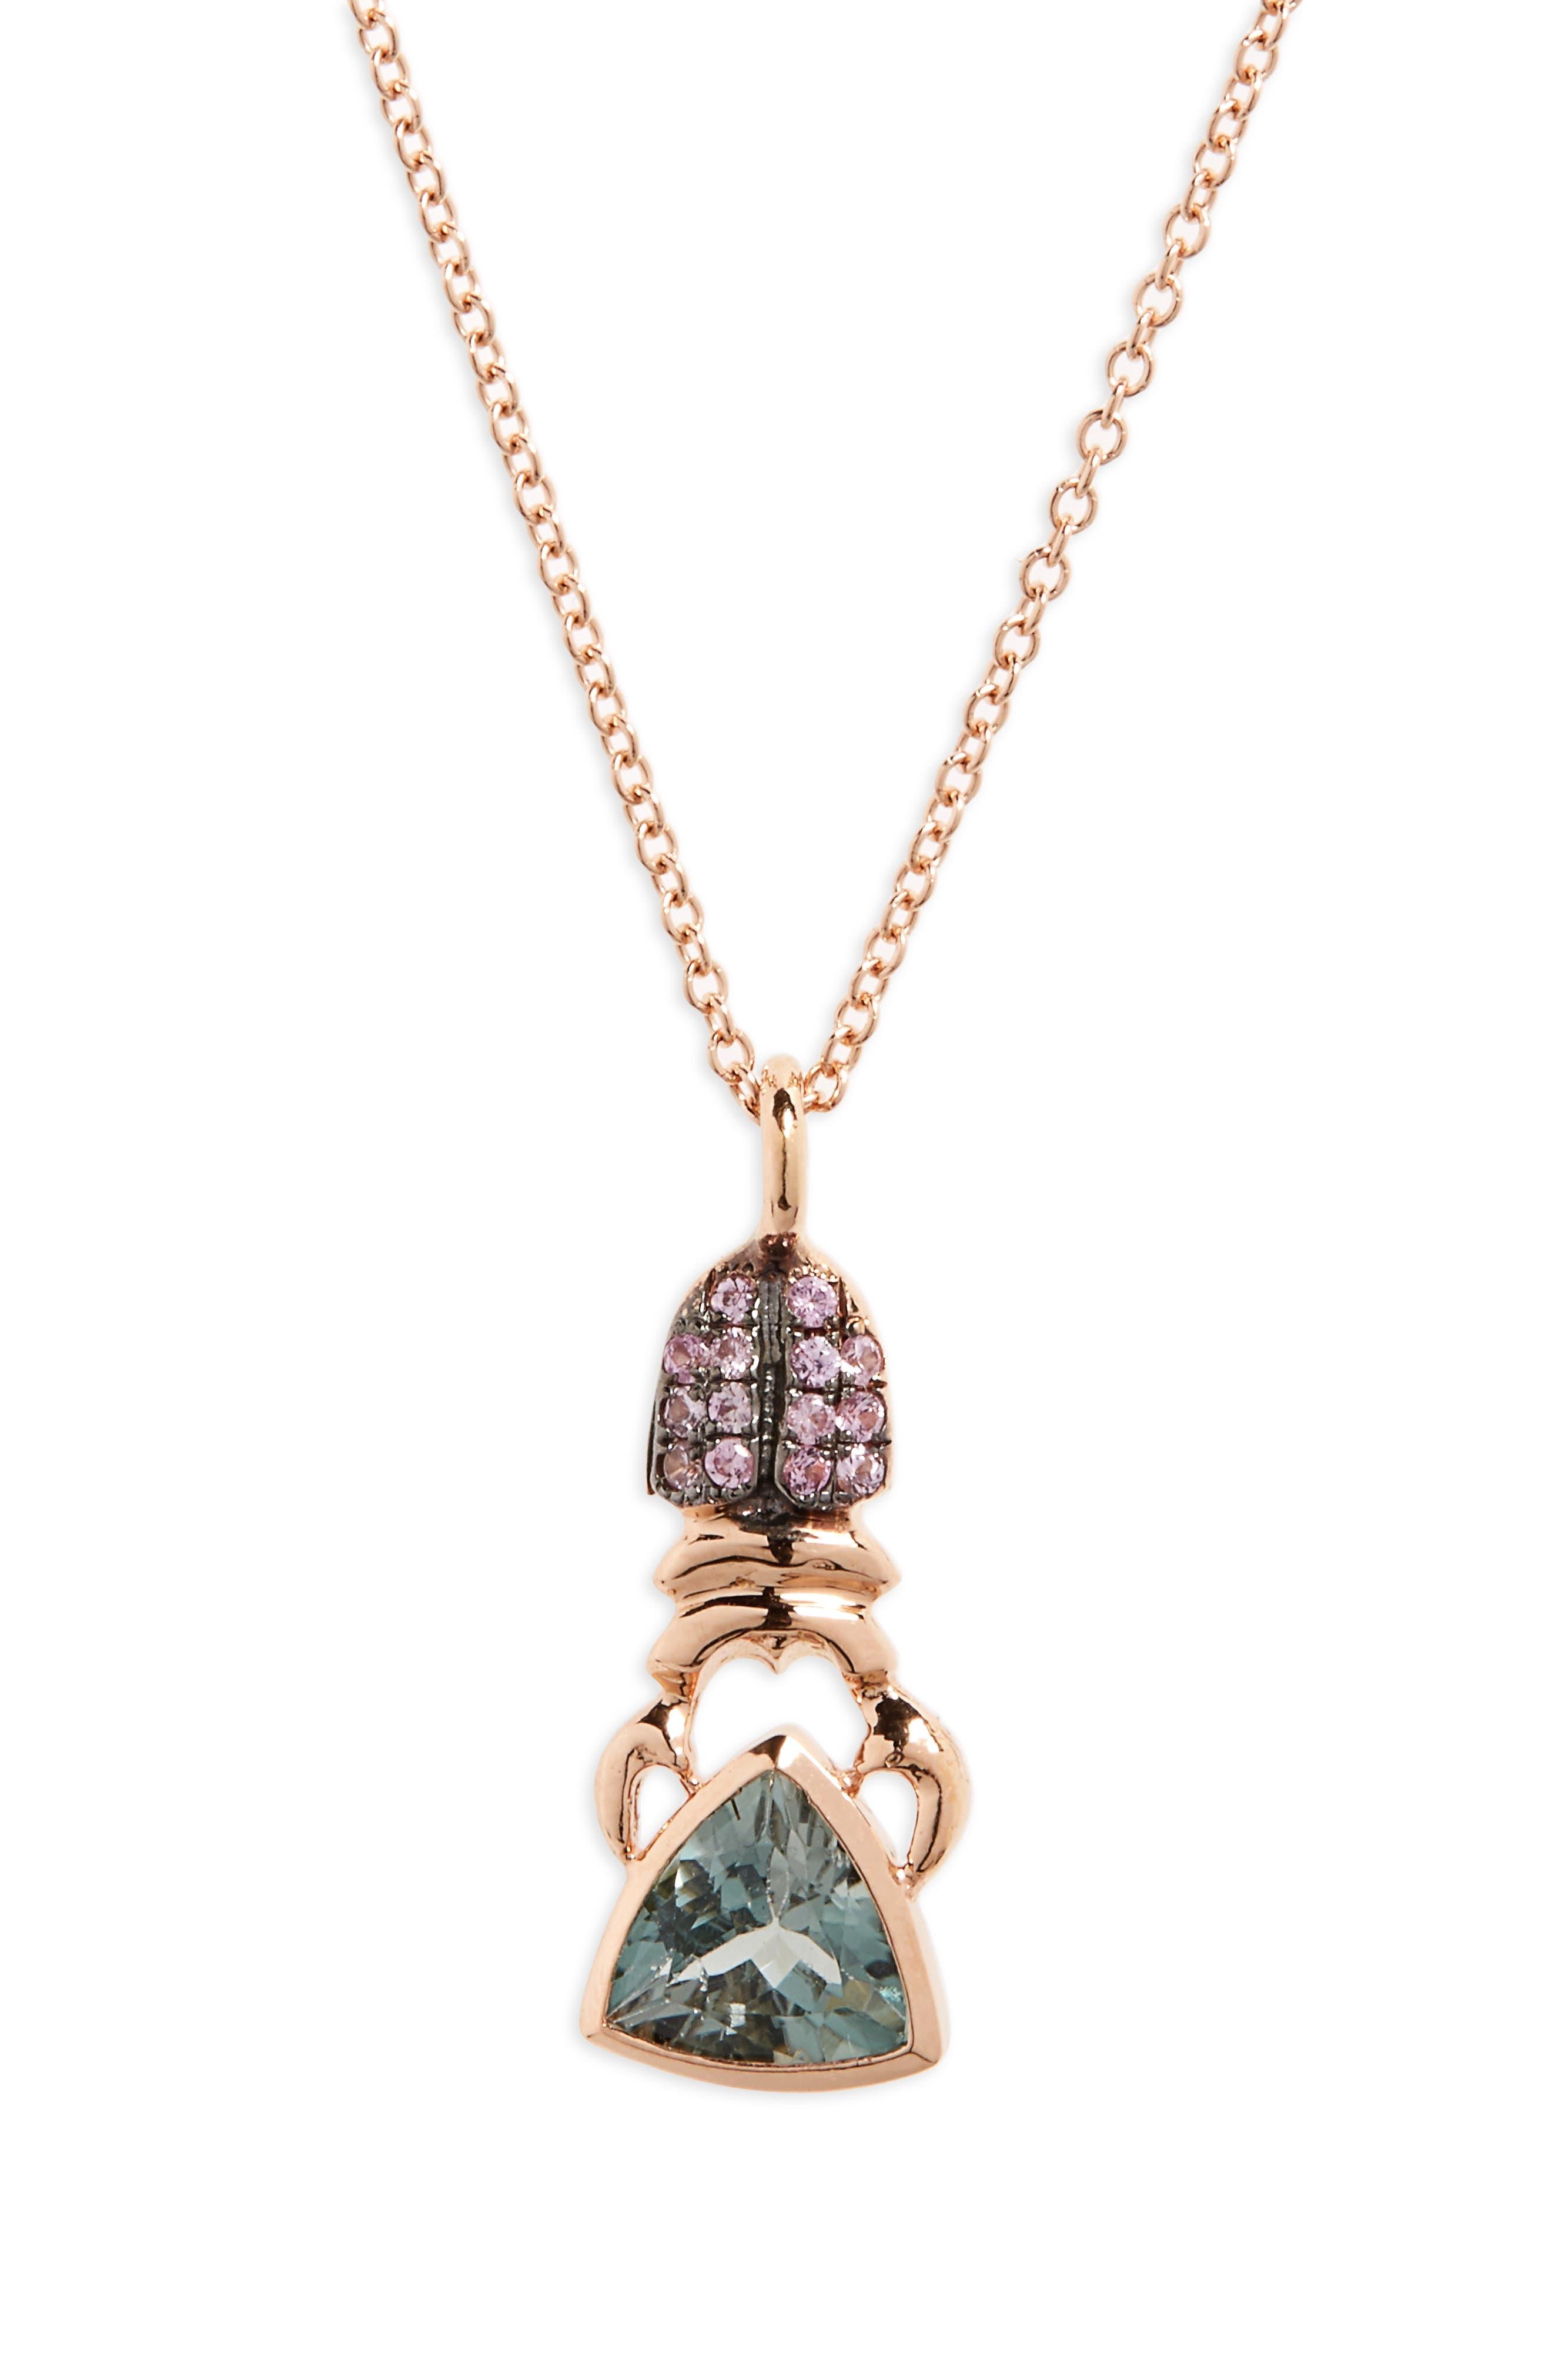 Main Image - Daniela Villegas Khepri Sapphire Pendant Necklace